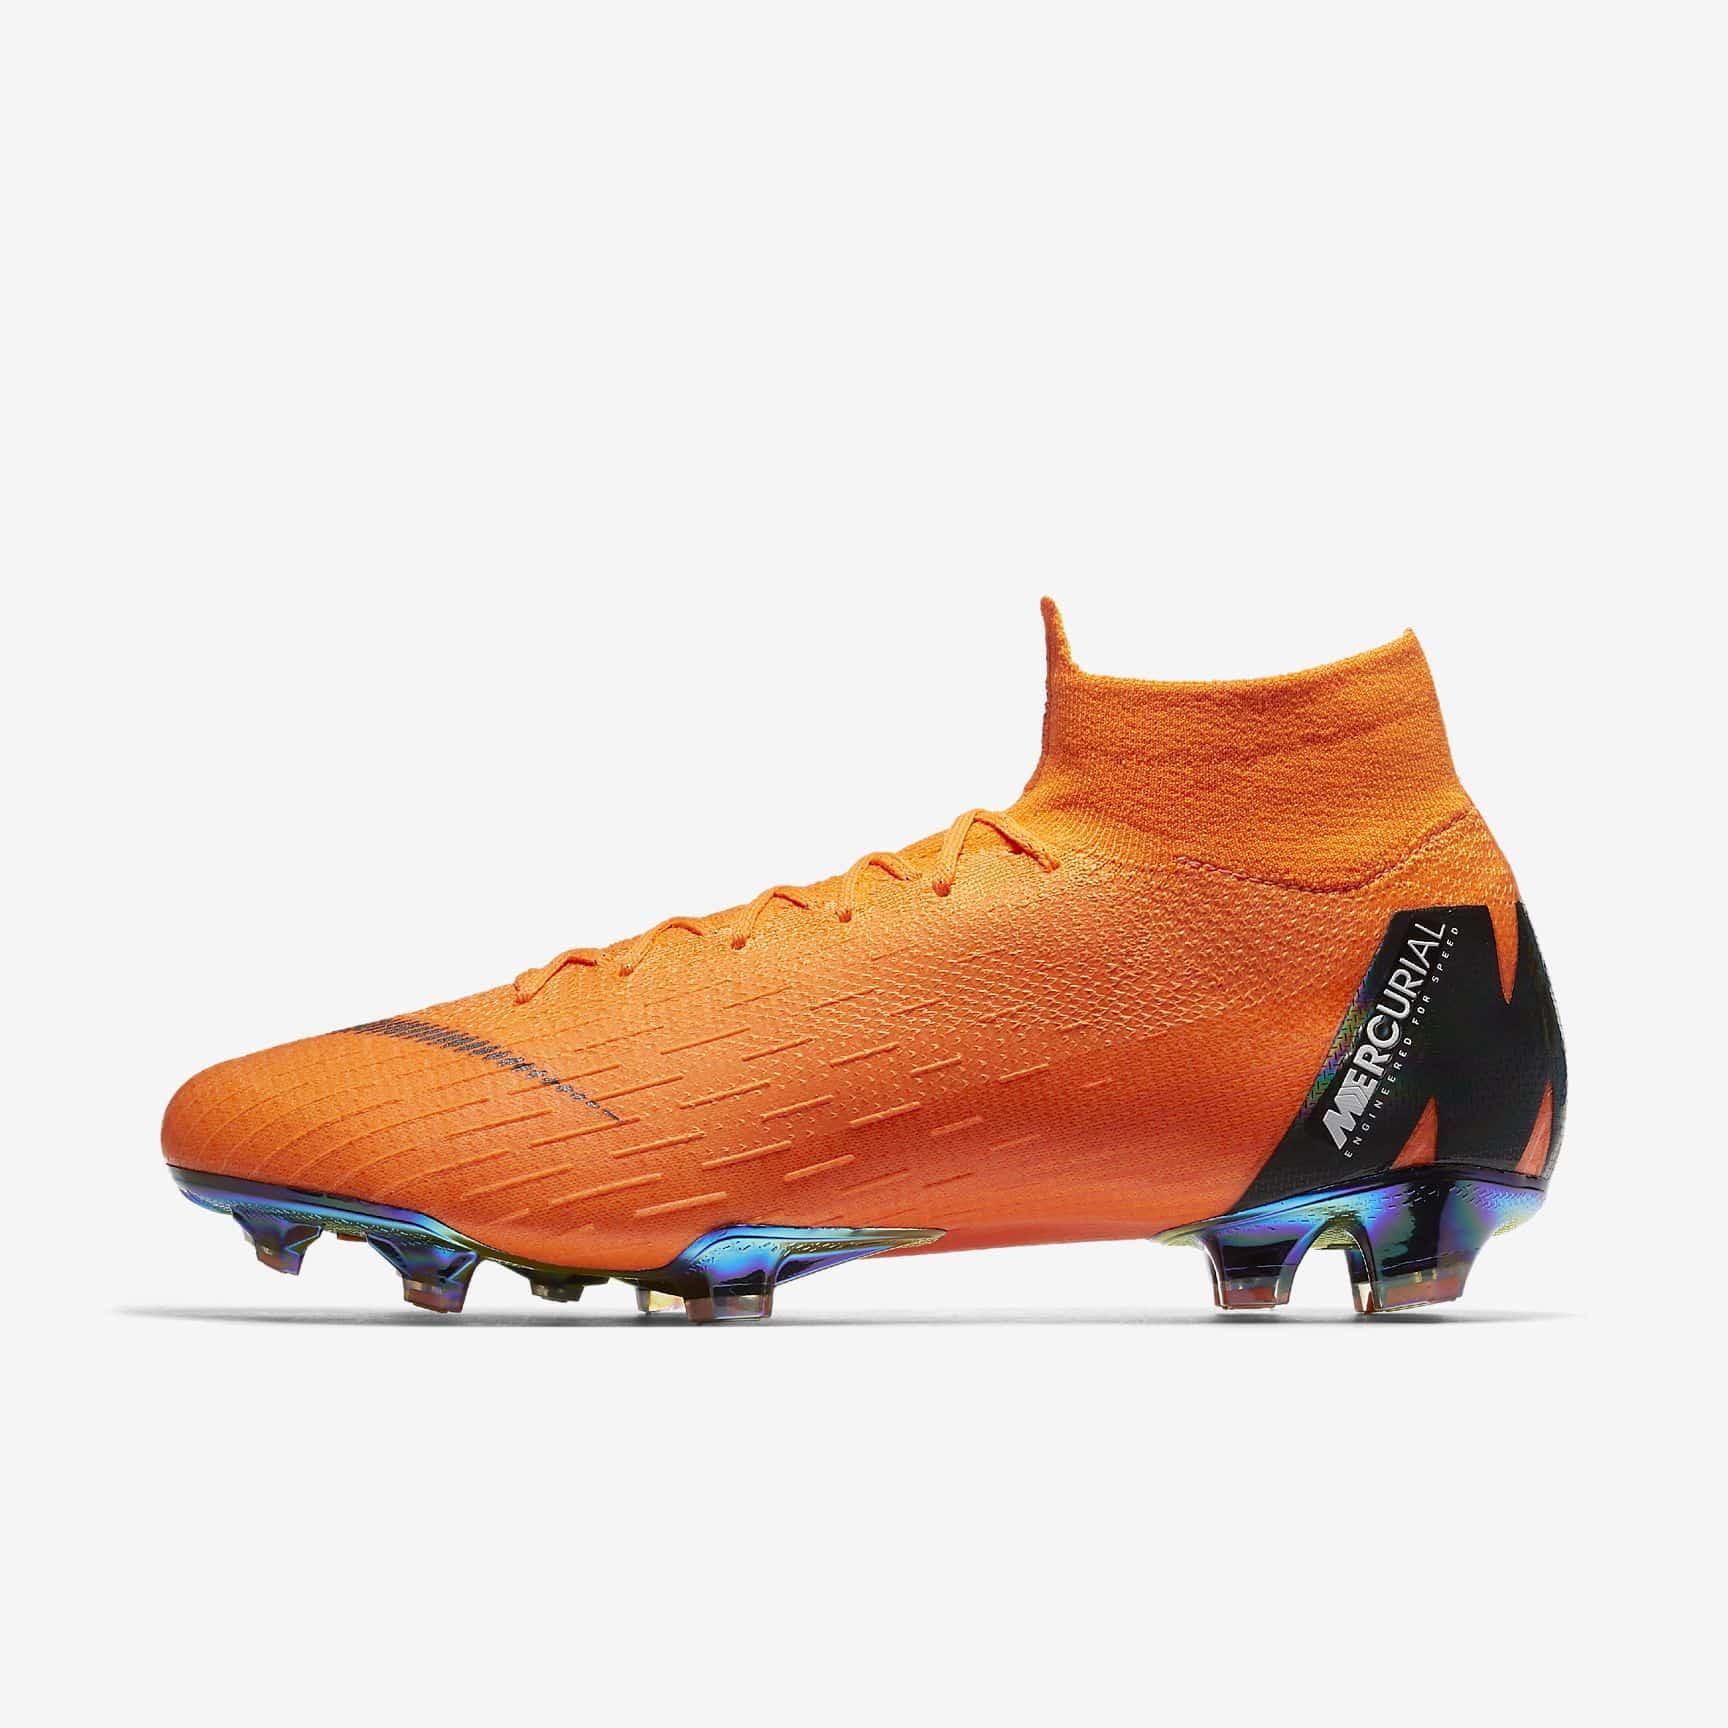 chaussures-football-Nike-Mercurial-Superfly-XI-Elite-img1